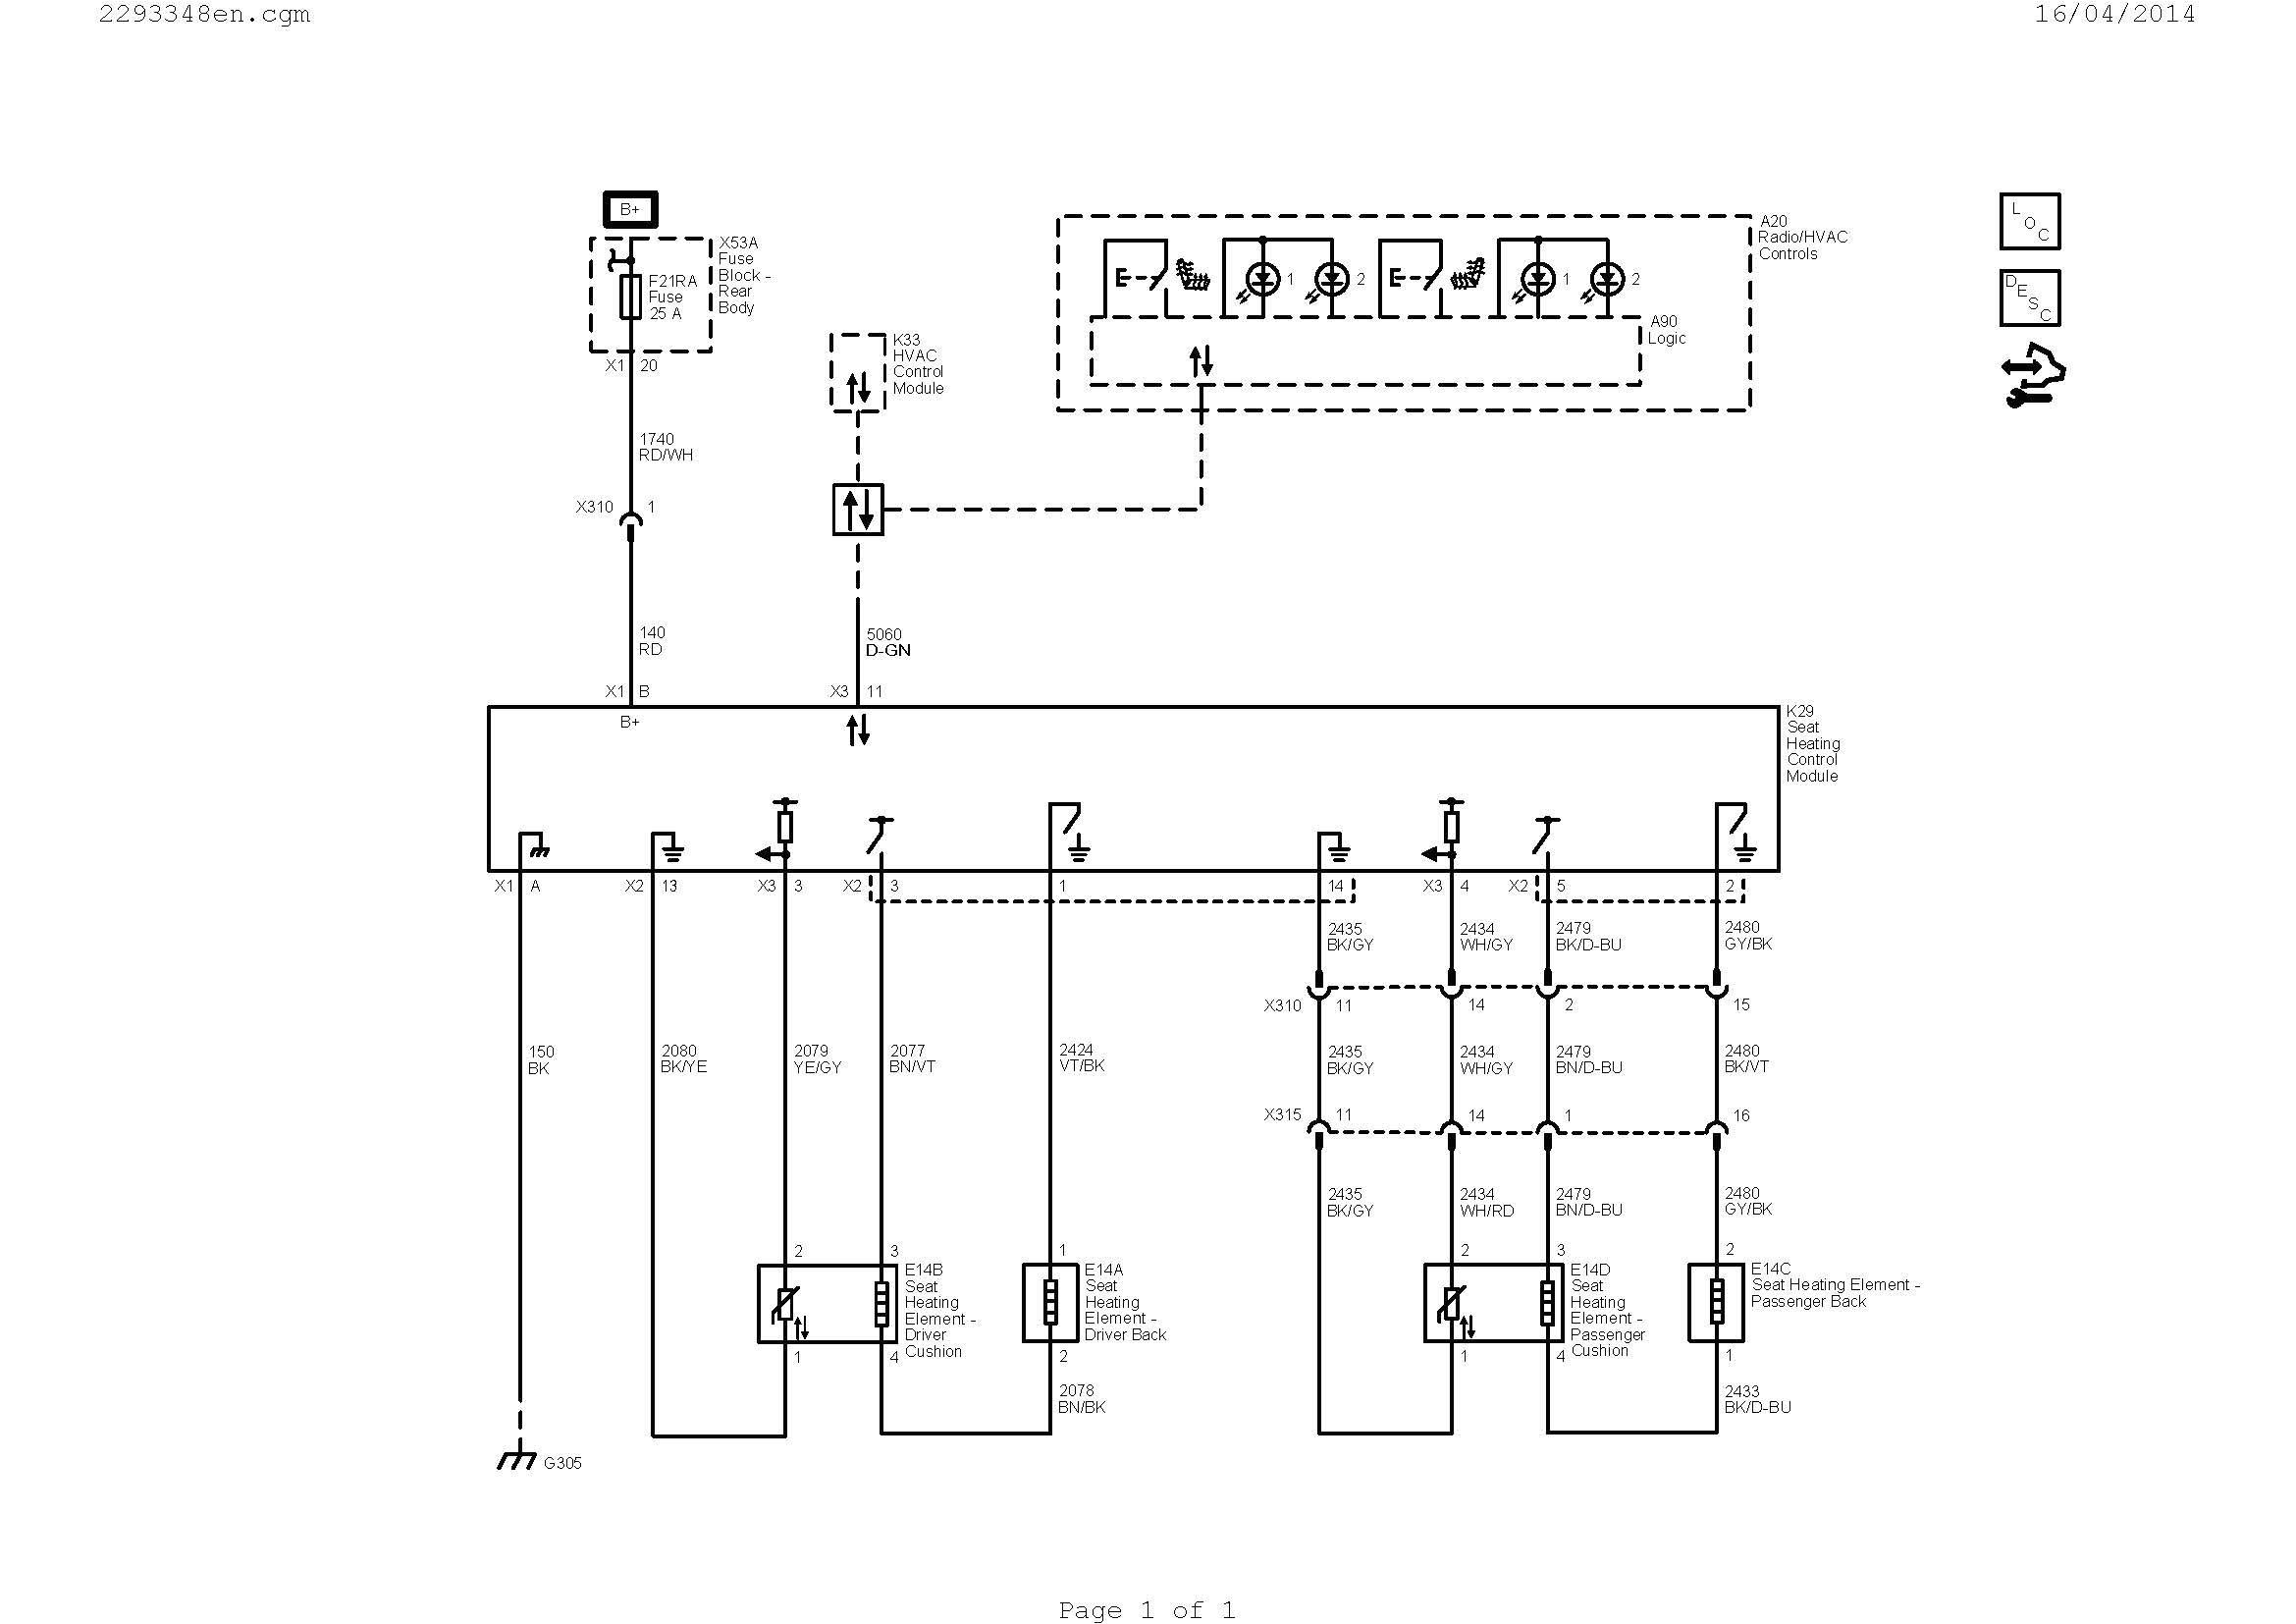 wiring diagram ac valid hvac diagram best hvac diagram 0d wire diagram automotive